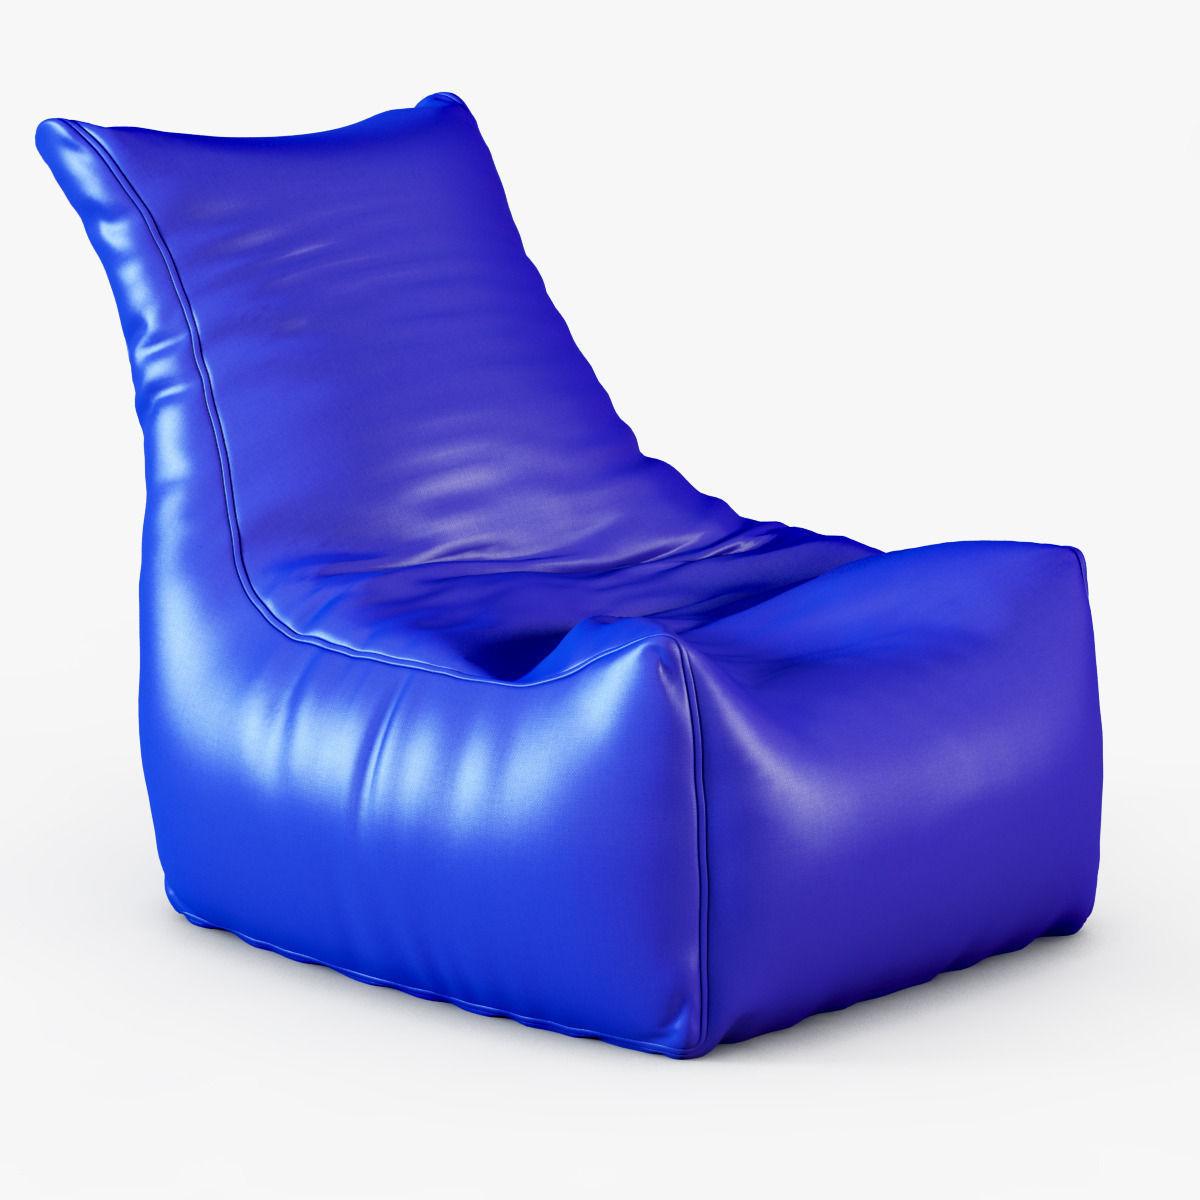 Style Homez Royal Blue Chair Bean Bag 3d Model Max 1 ...